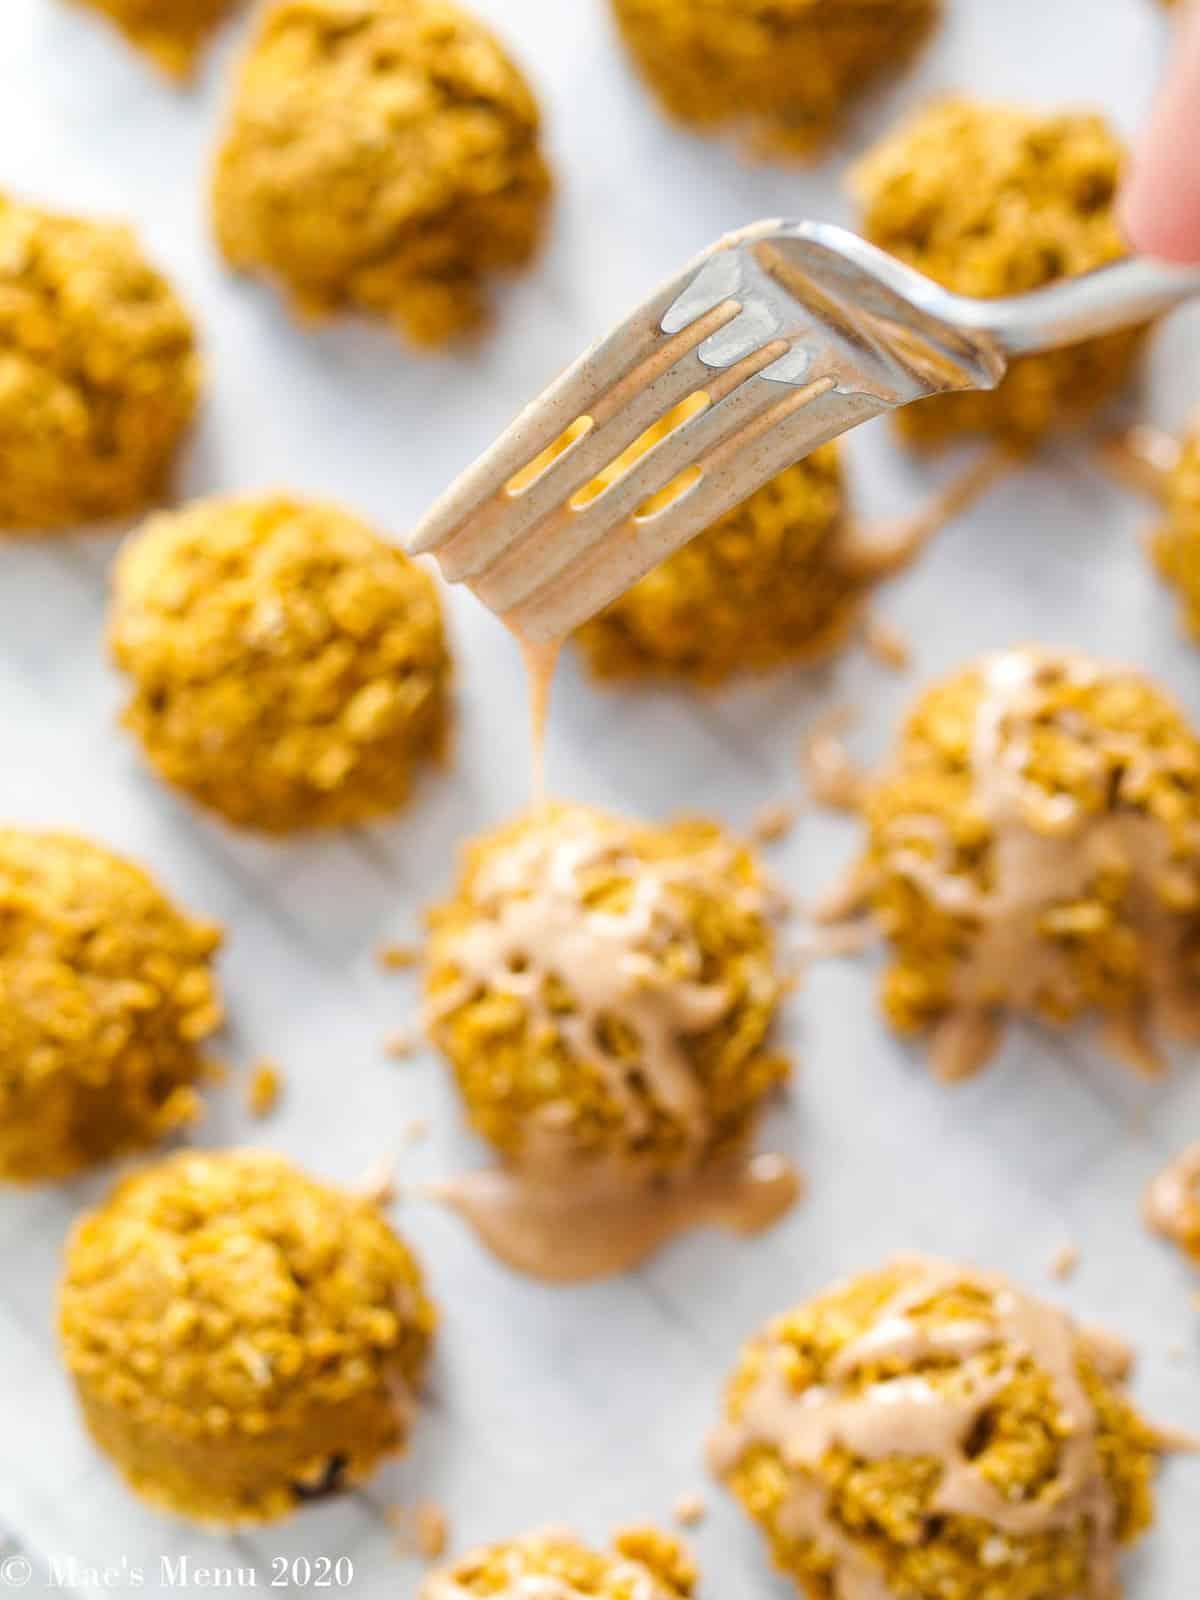 Drizzling the cinnamon maple glaze on the gluten-free oatmeal pumpkin cookies